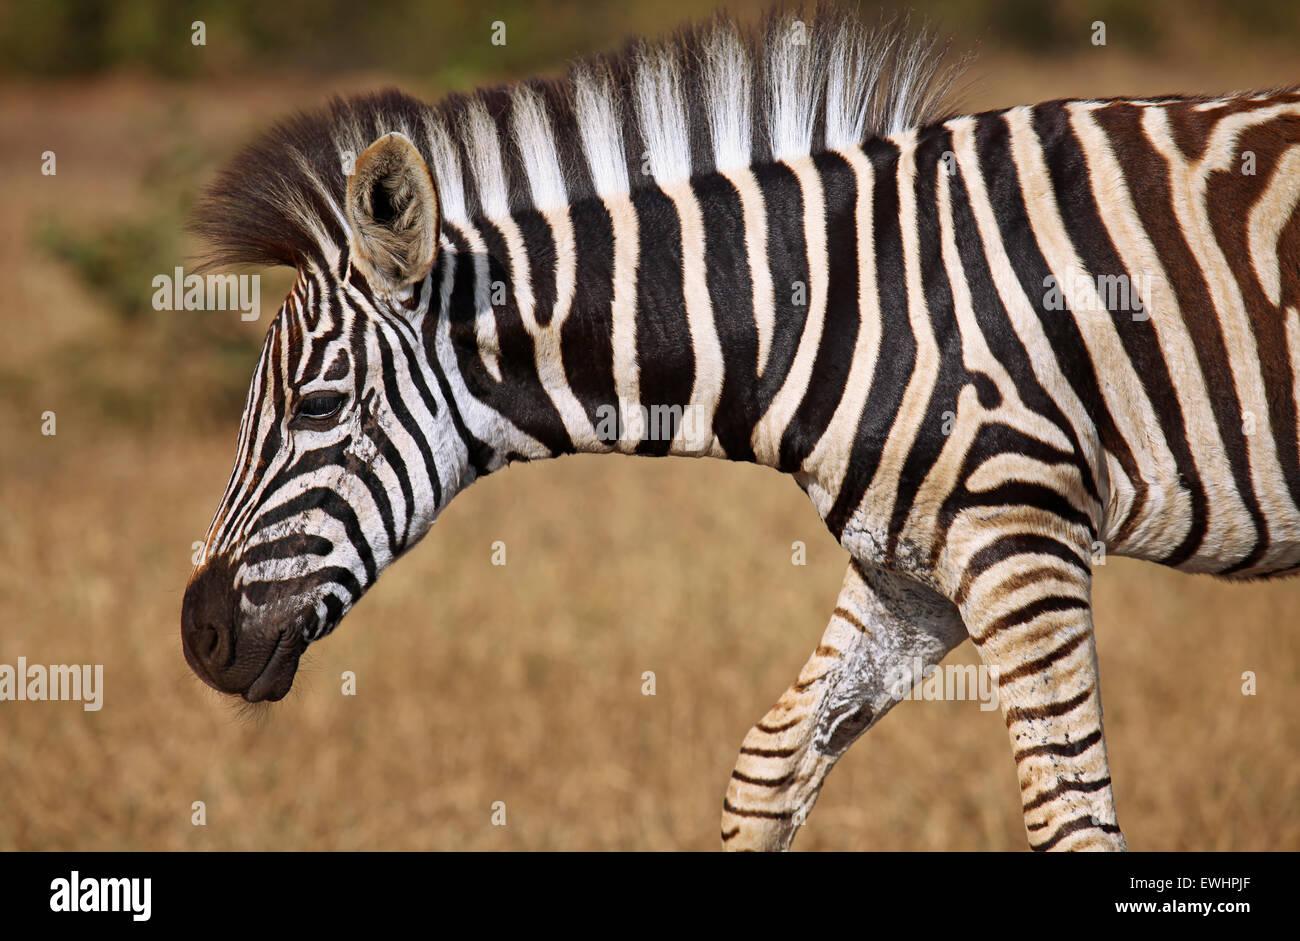 Young Plains Zebra, Perissodactyla, Equus quagga - Stock Image